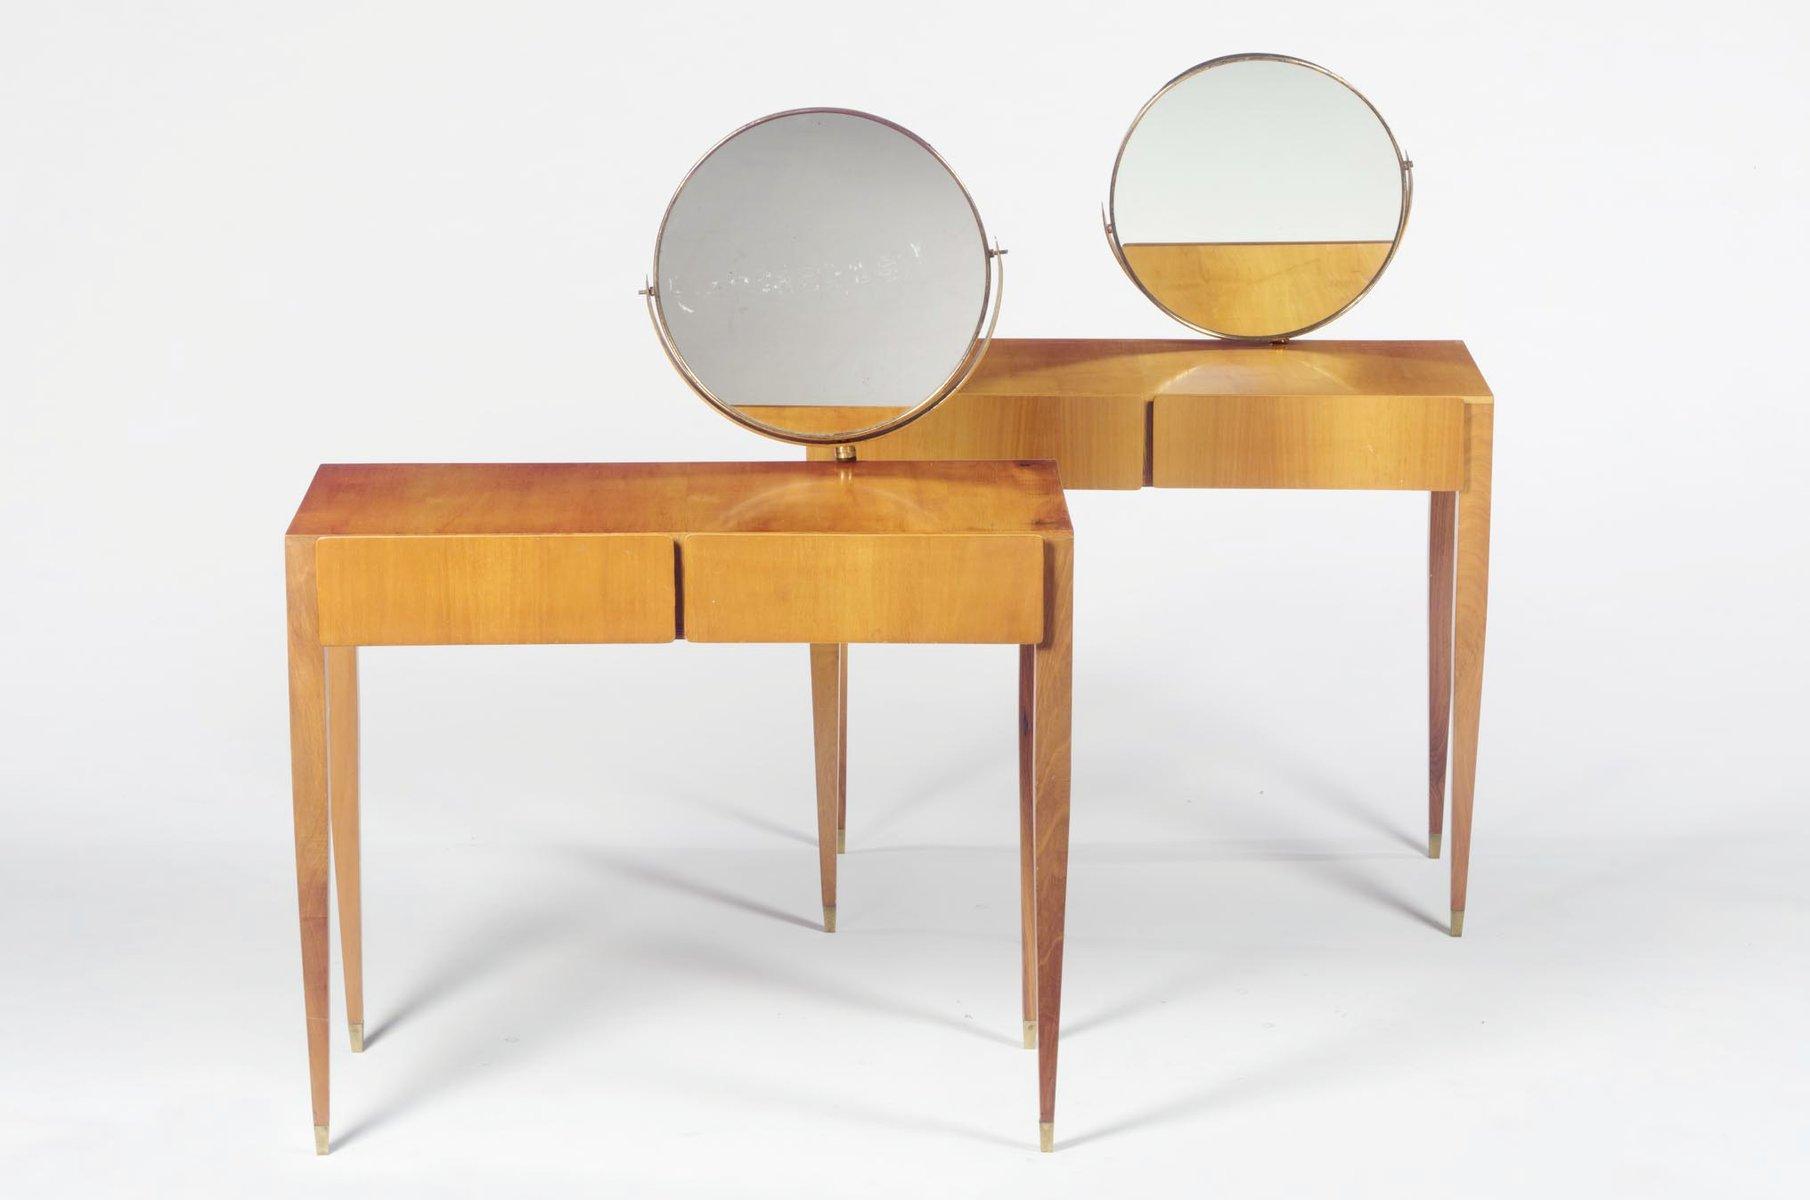 Vanity Mirror by Gio Ponti for Fontana Arte 1955 for sale at Pamono